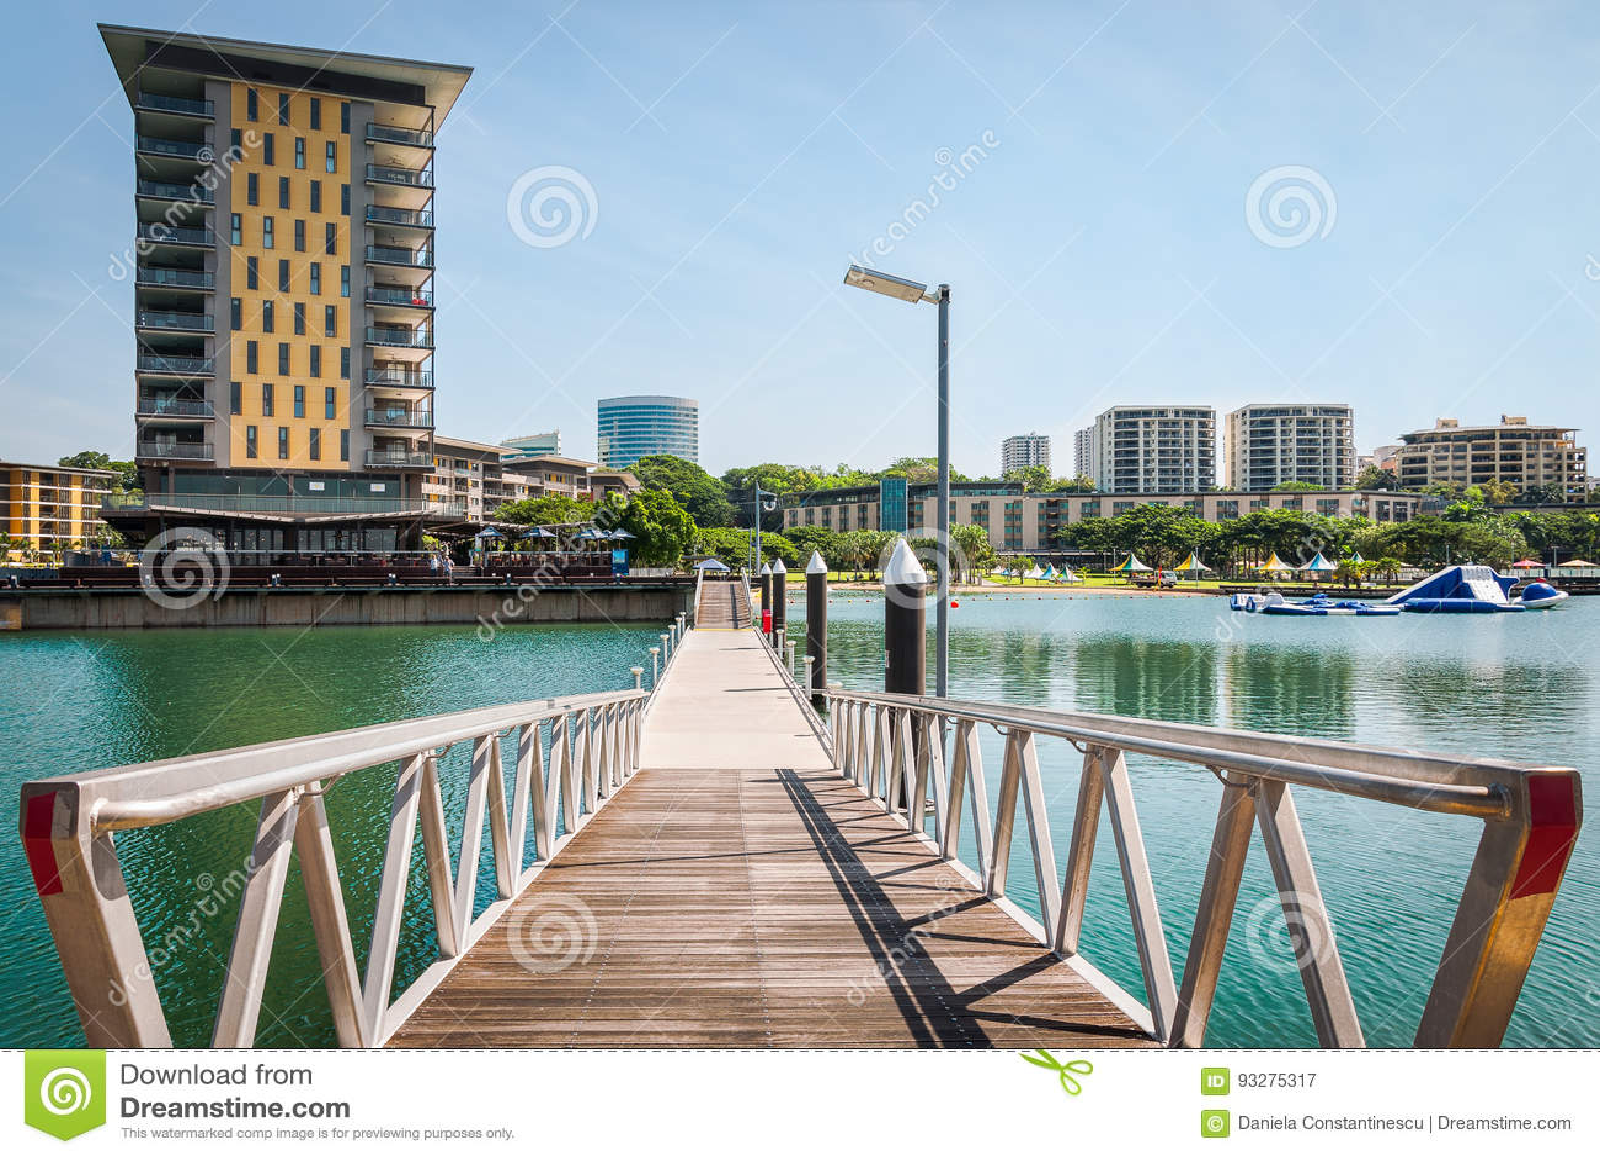 Darwin Waterfront Wharf, Northern Territory, Australia